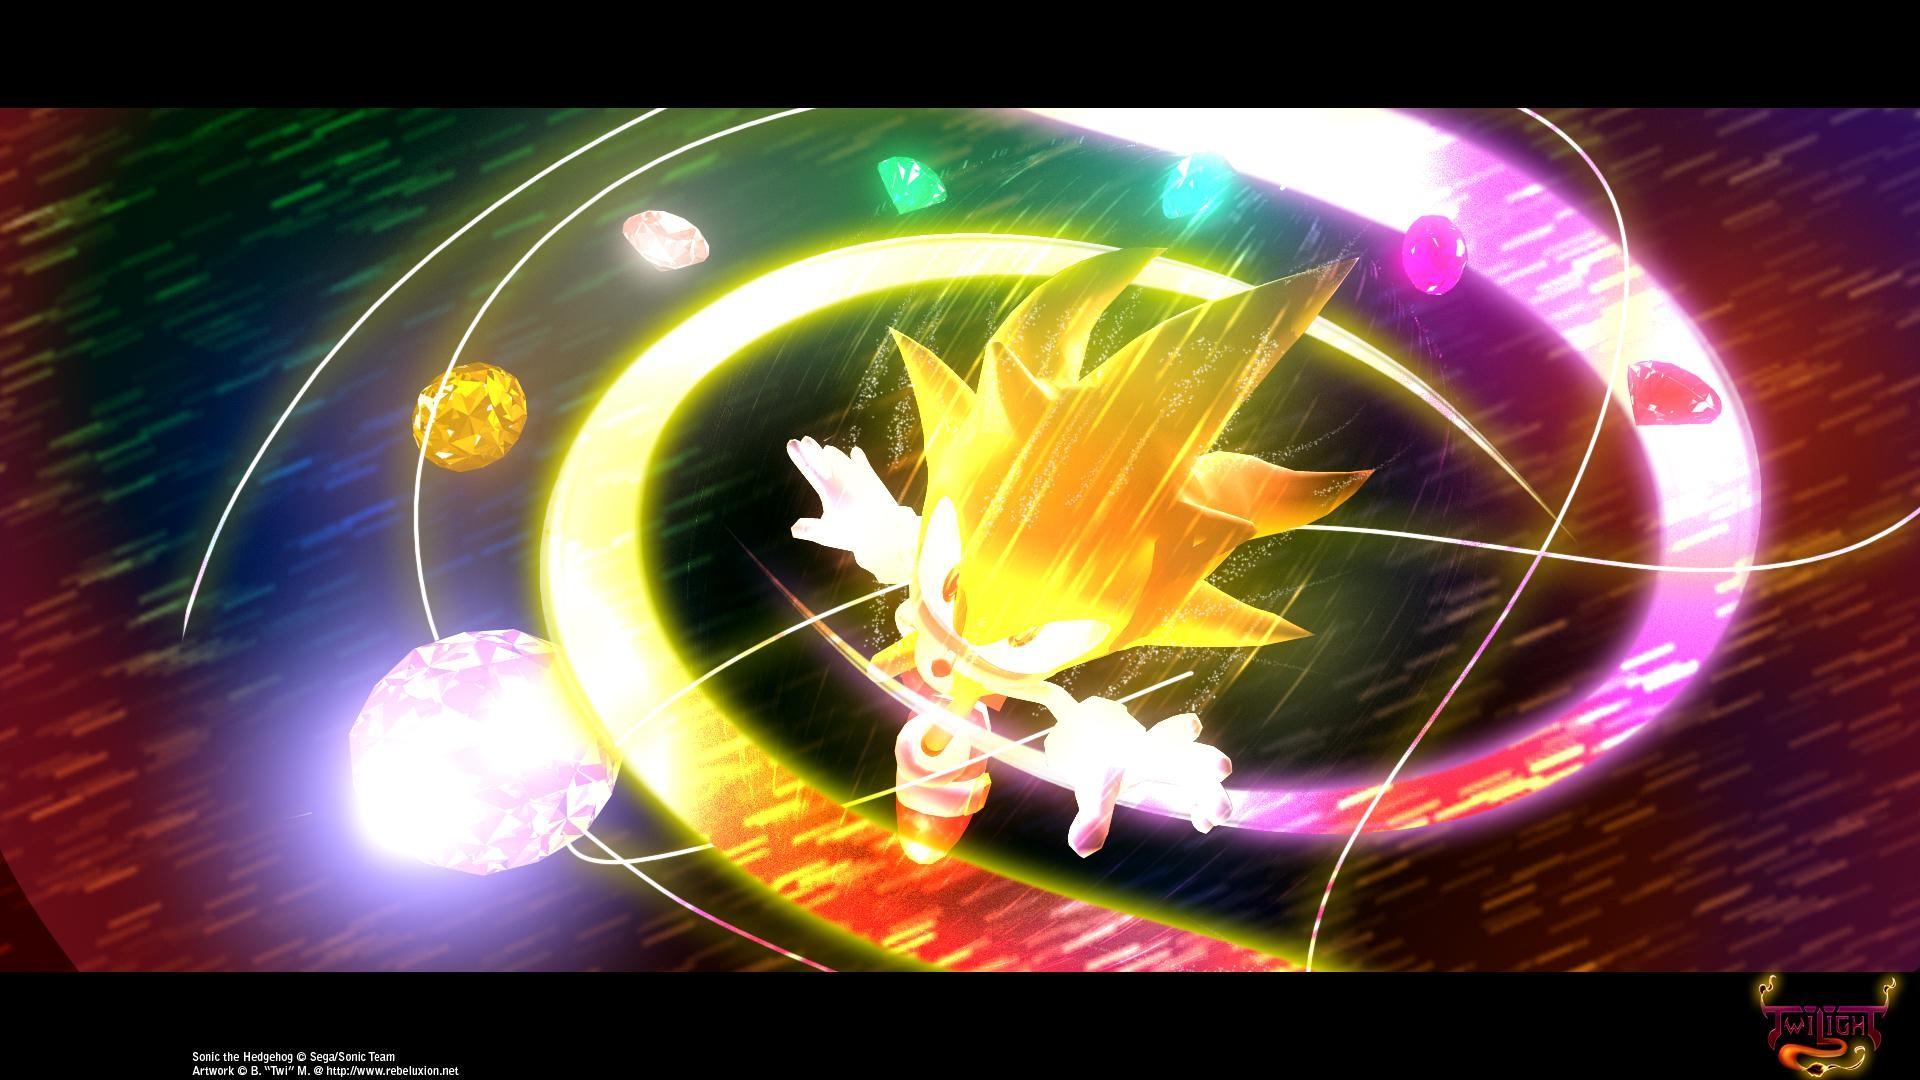 Super Sonic download Super Sonic image